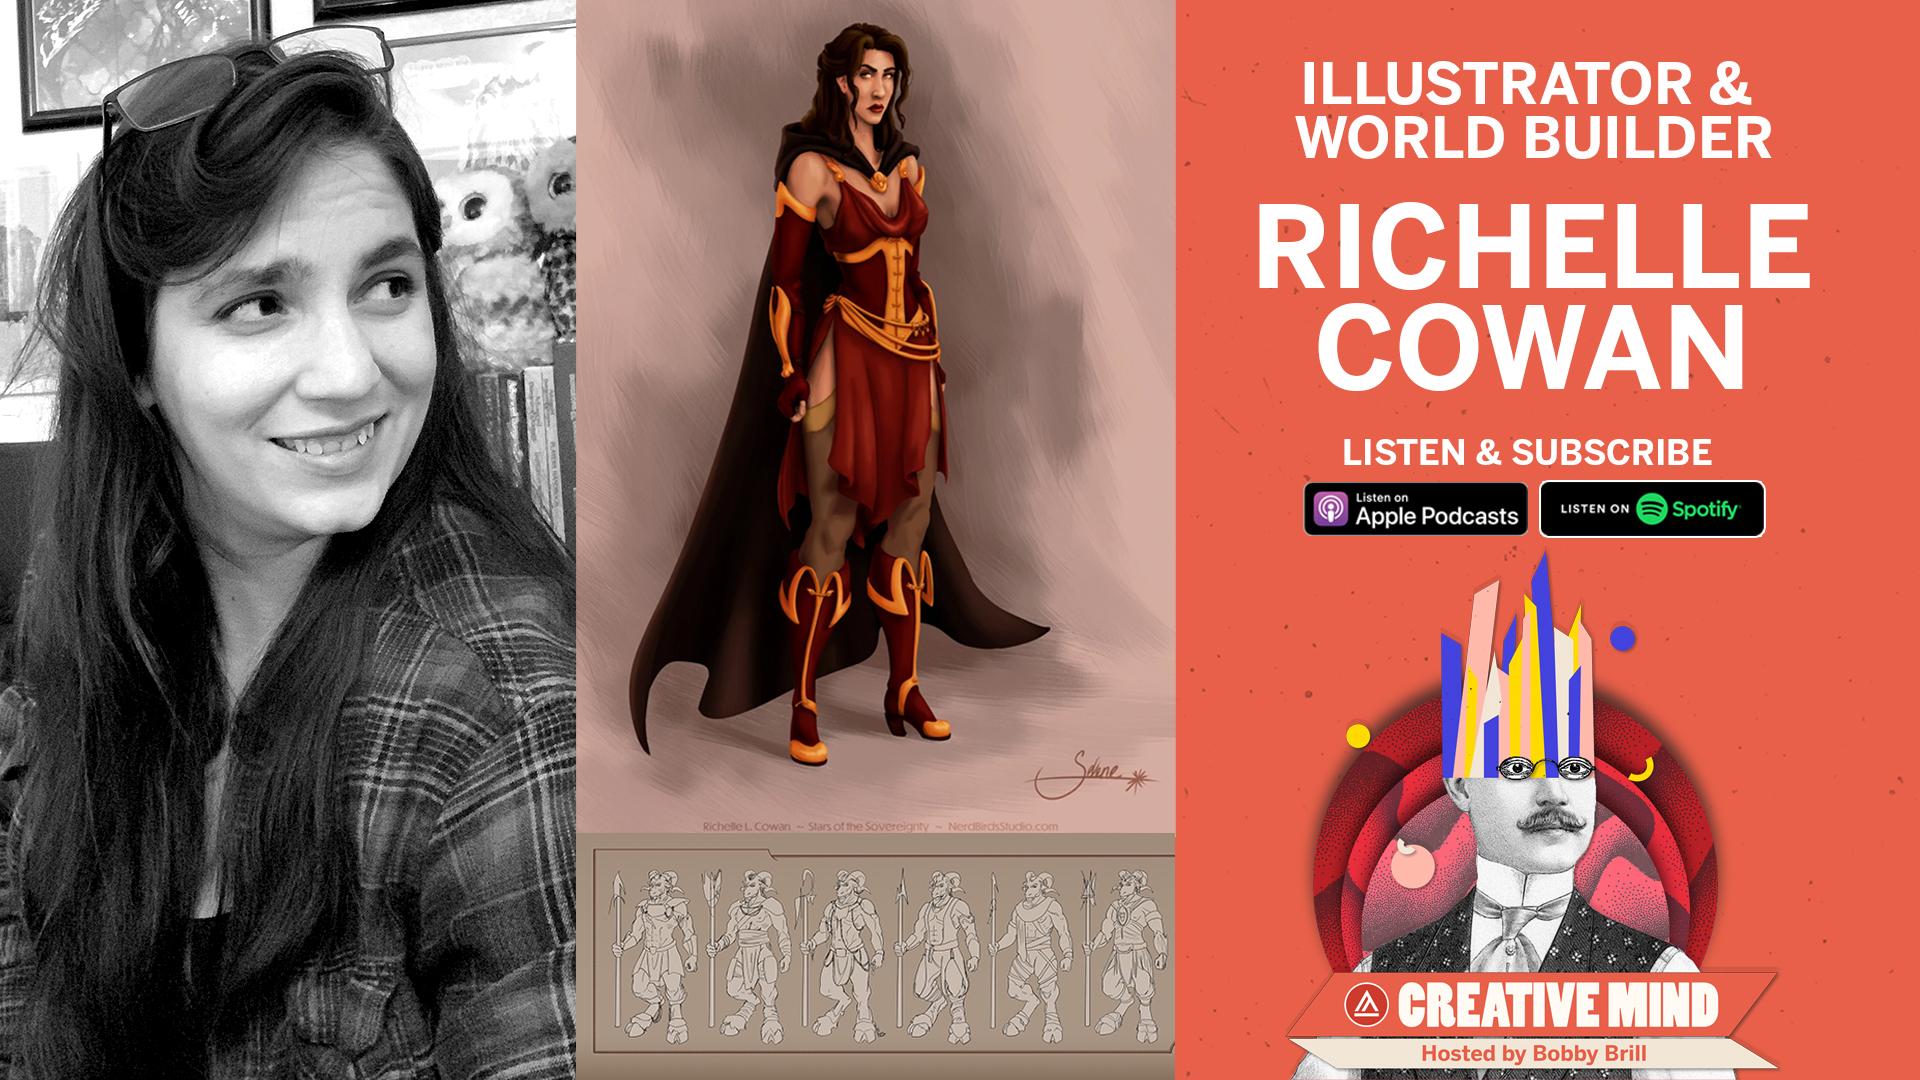 Richelle Cowan on Creative Mind Podcast